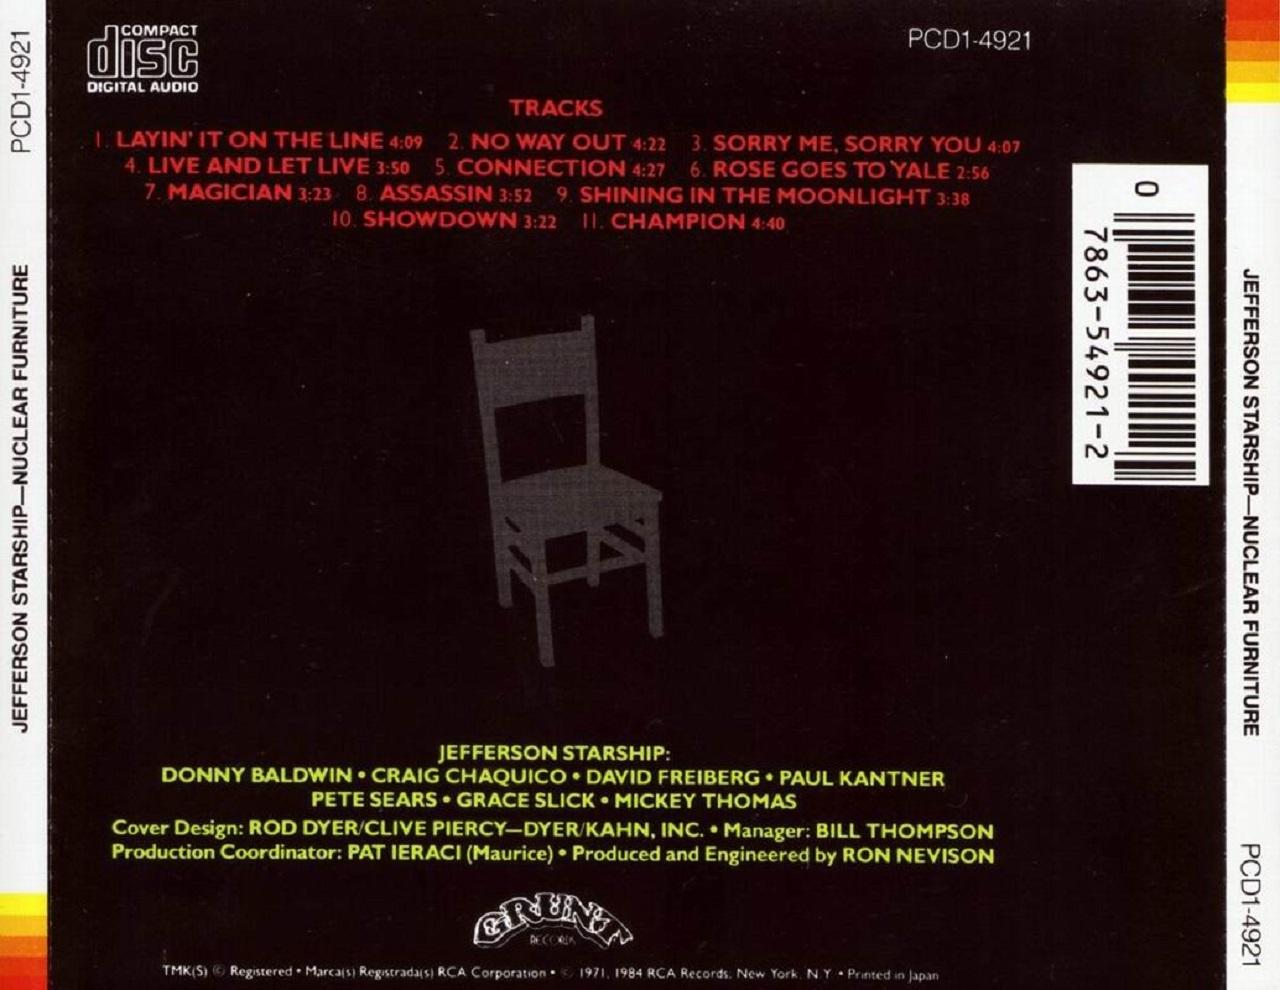 jefferson starship nuclear furniture full album